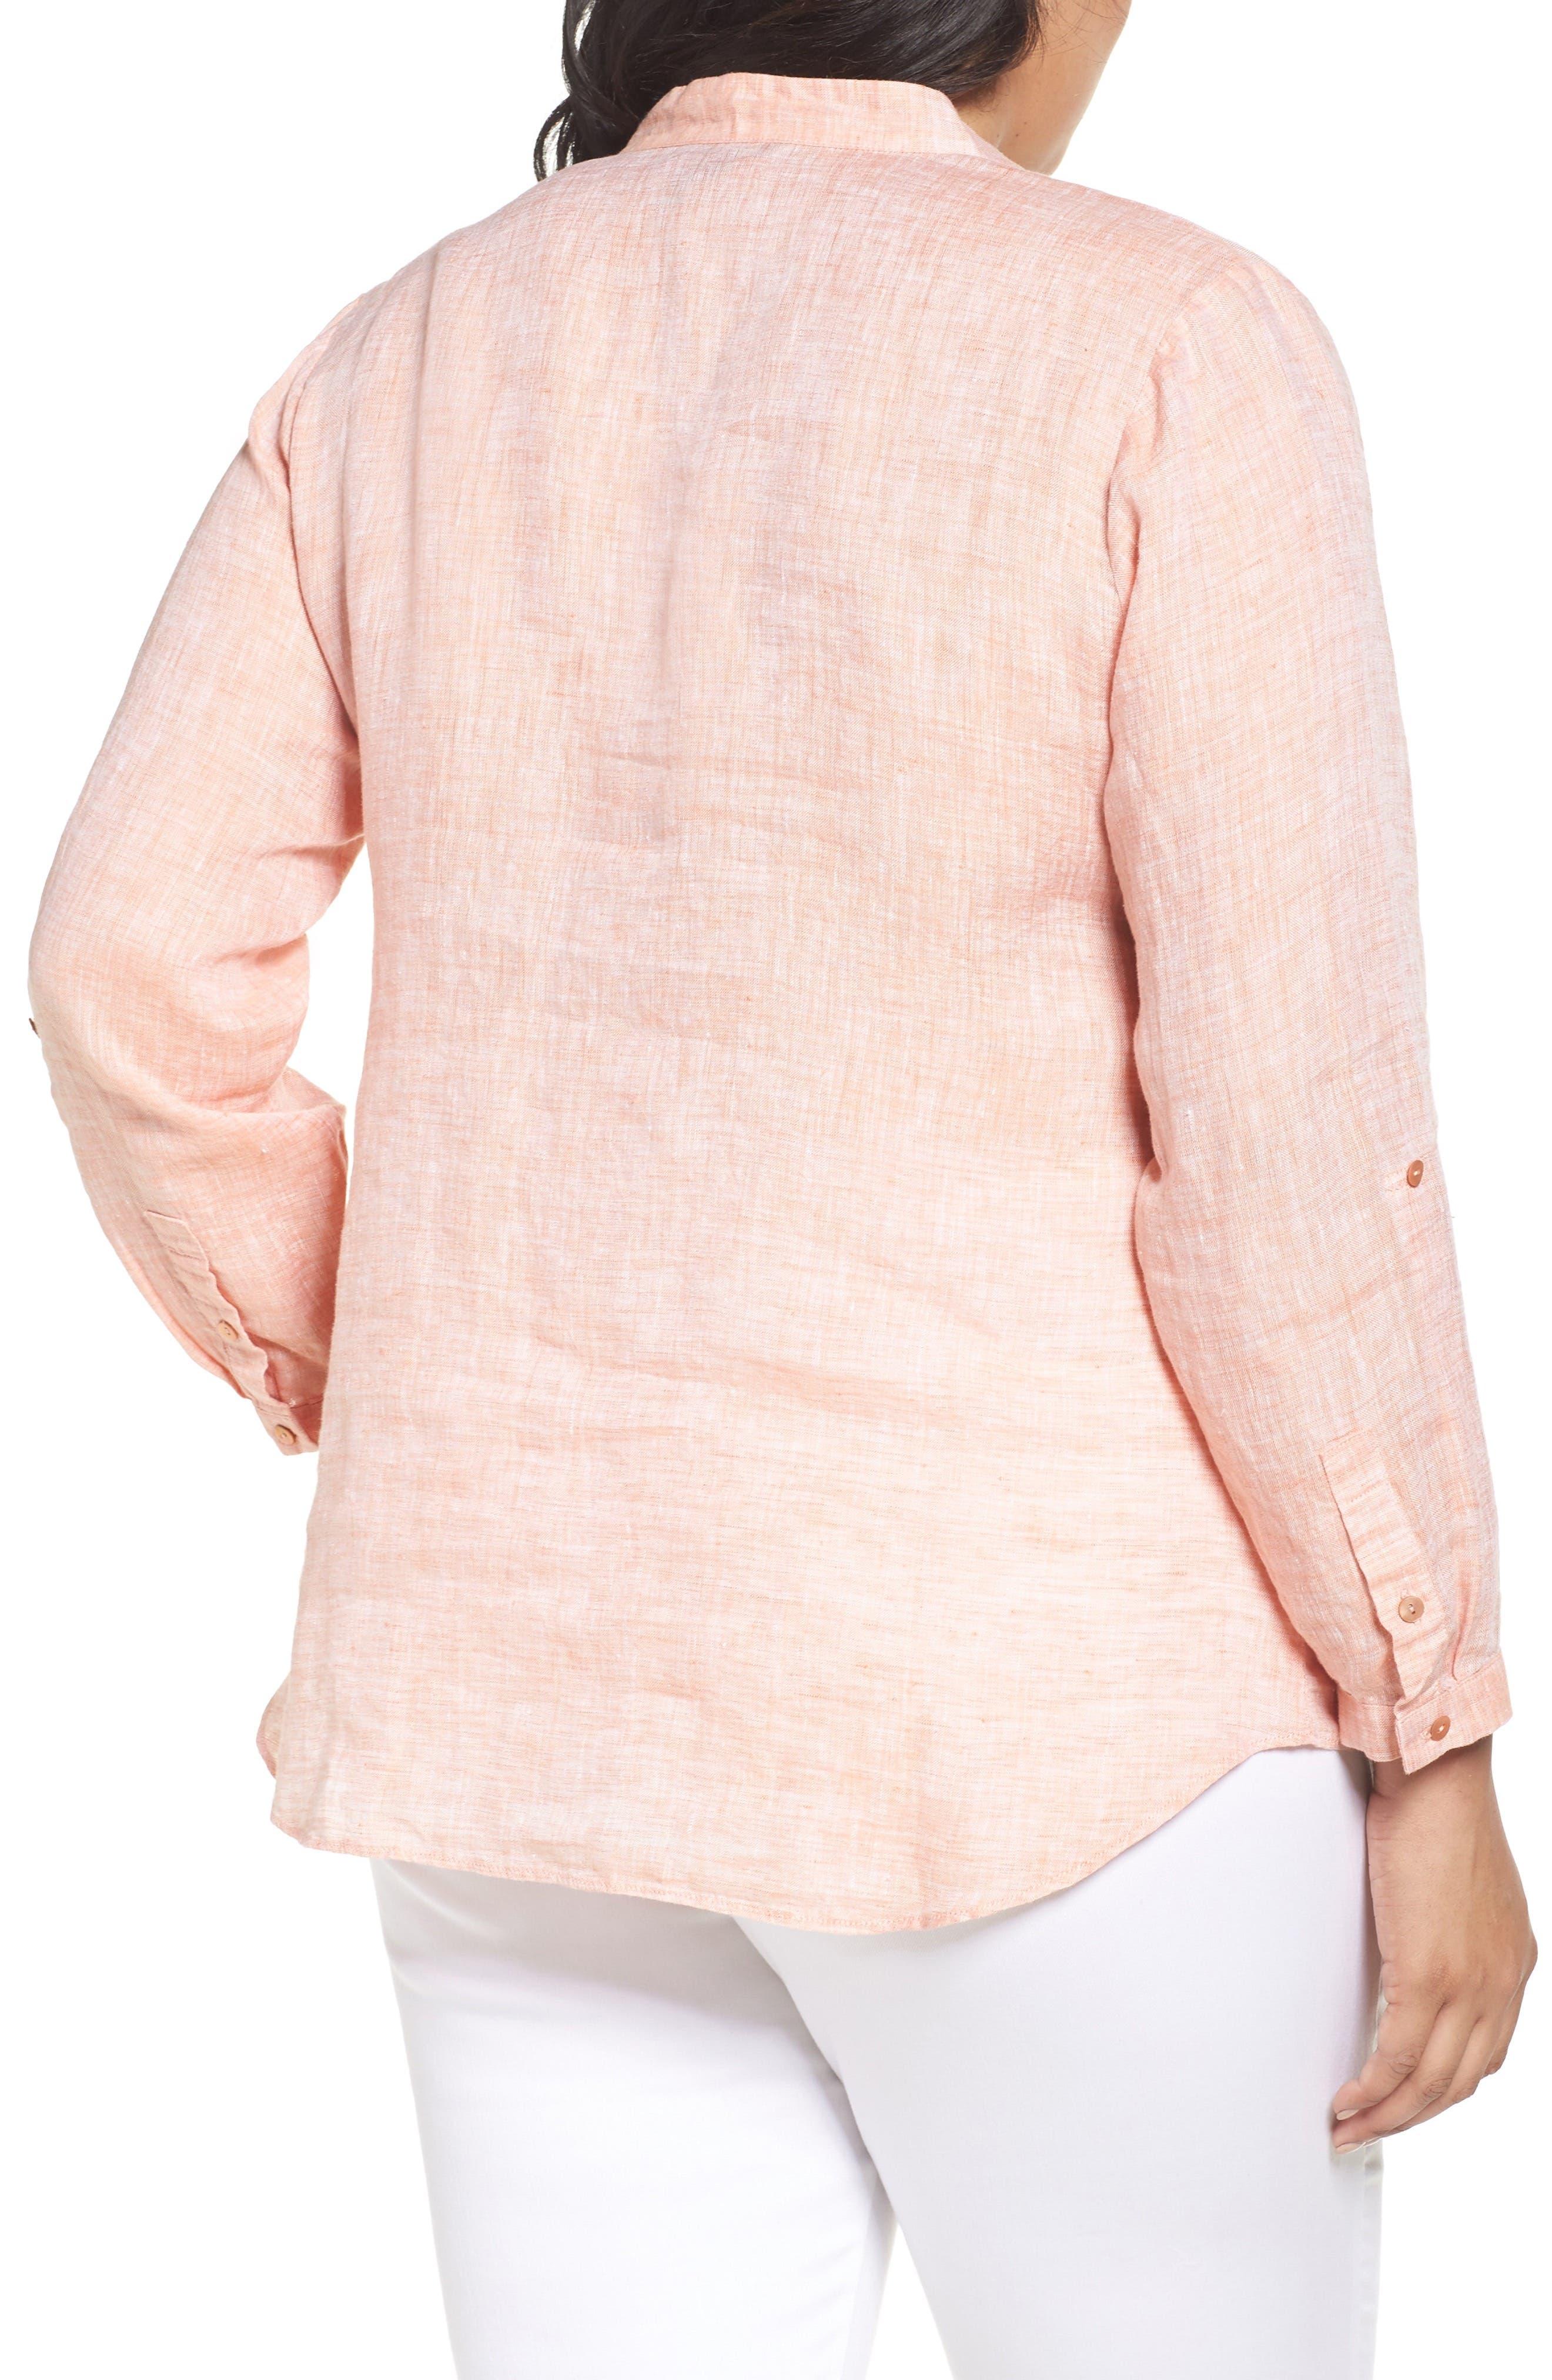 Alternate Image 2  - NIC+ZOE Drifty Woven Linen Shirt (Plus Size)